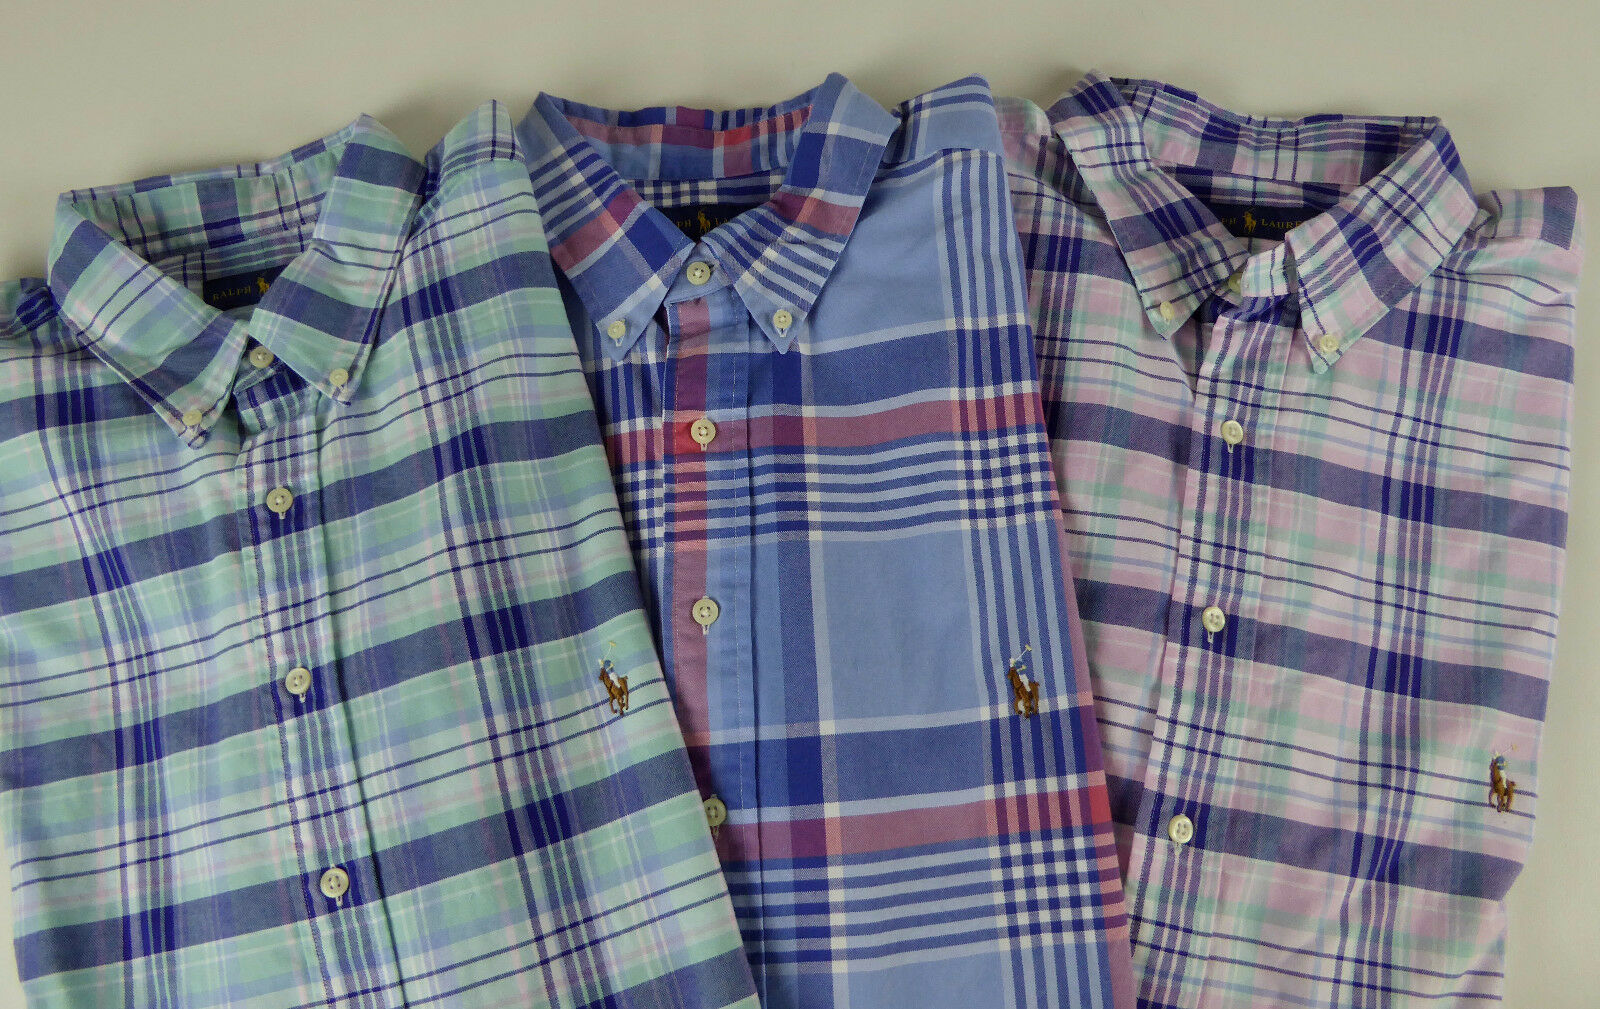 Polo Ralph Lauren LS 100% Cotton Plaid Oxford Shirt  NWT Pink bluee Green